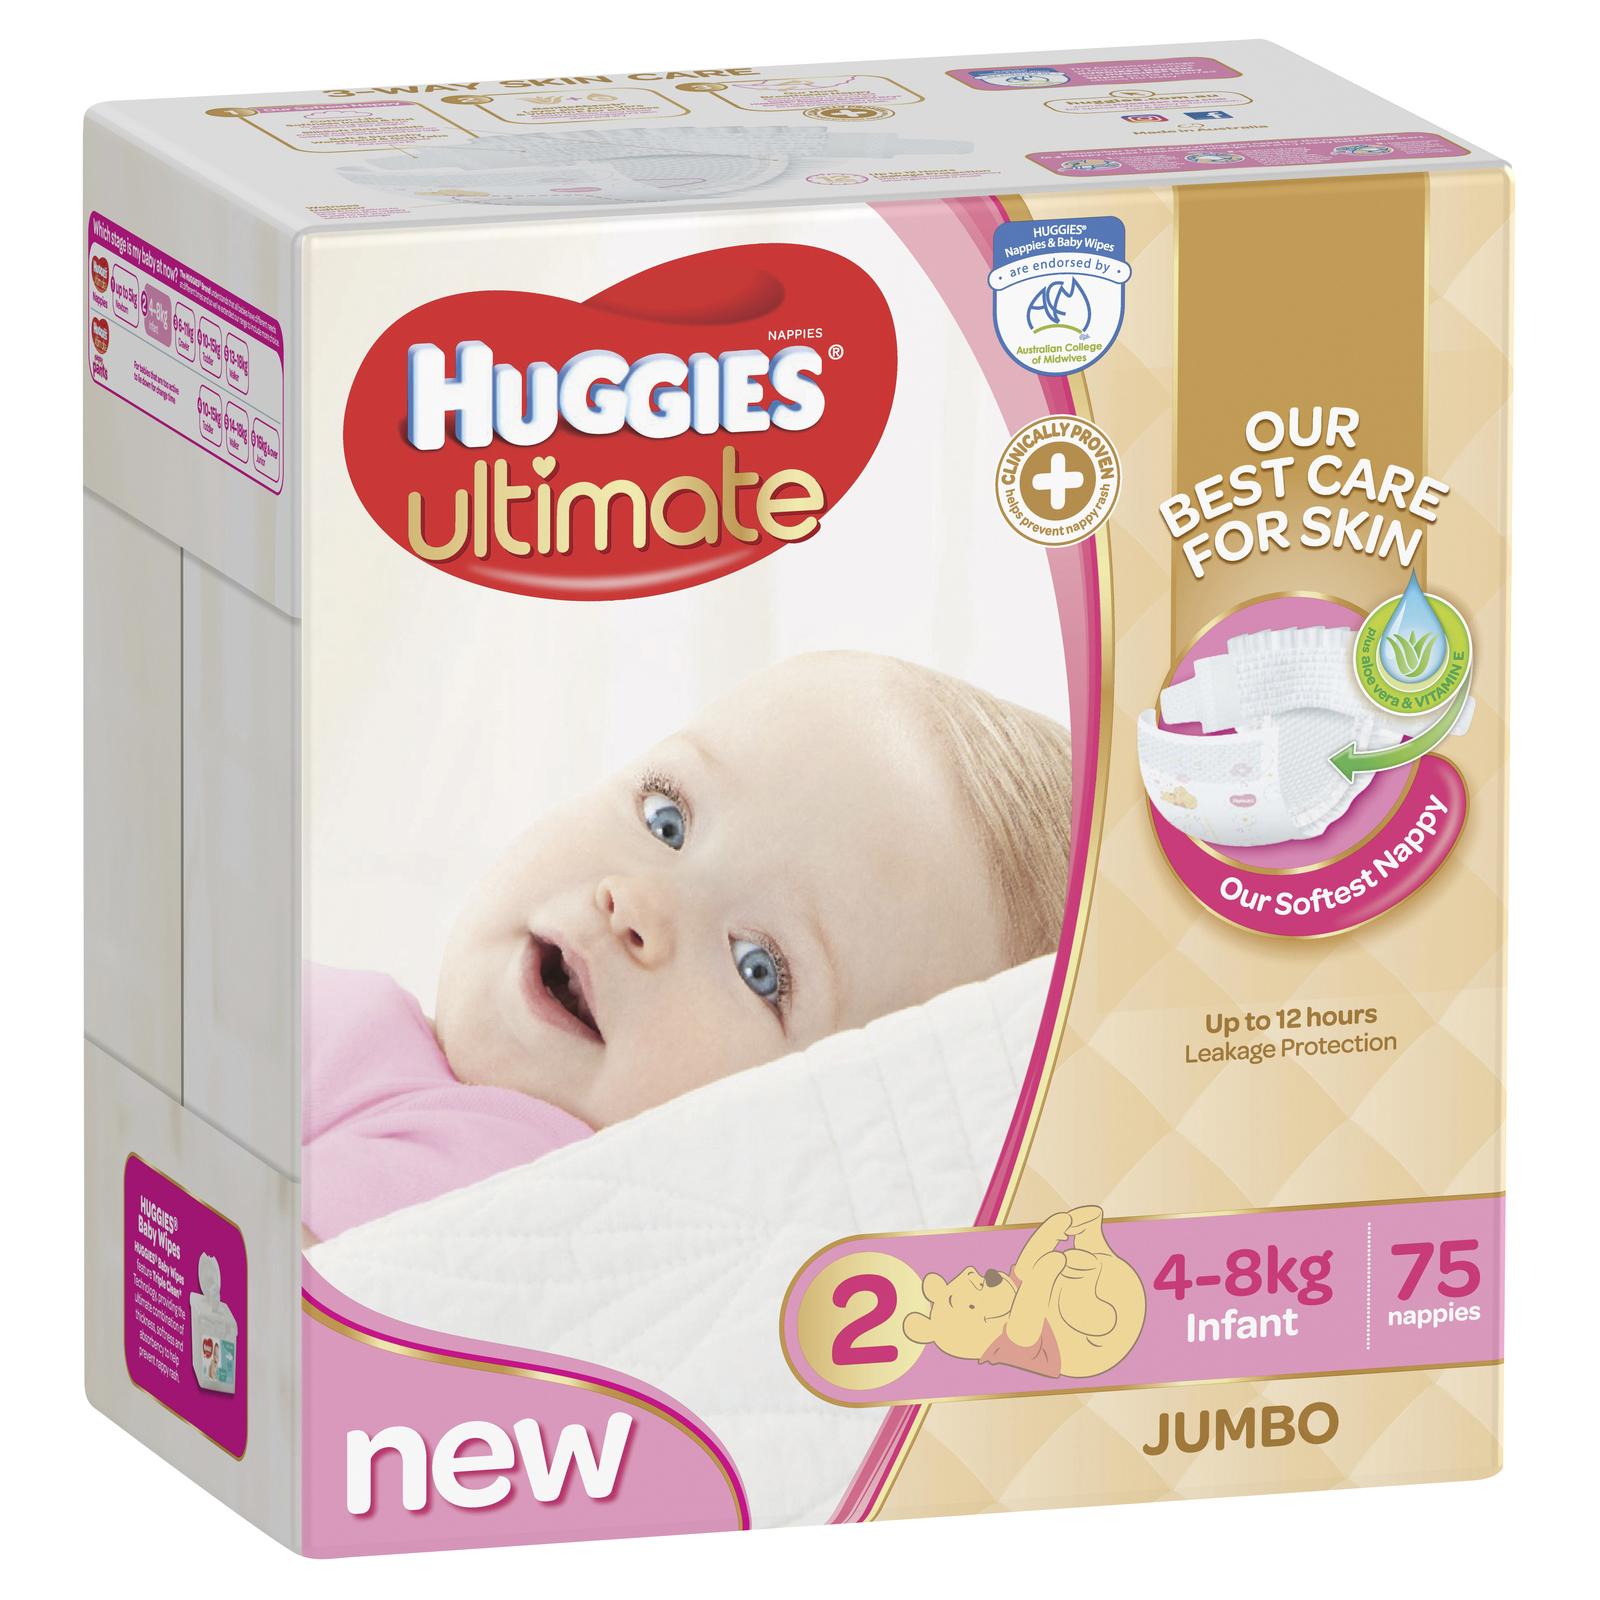 Huggies Ultimate Nappies: Jumbo Pack - Infant Girl 4-8kg (75) image